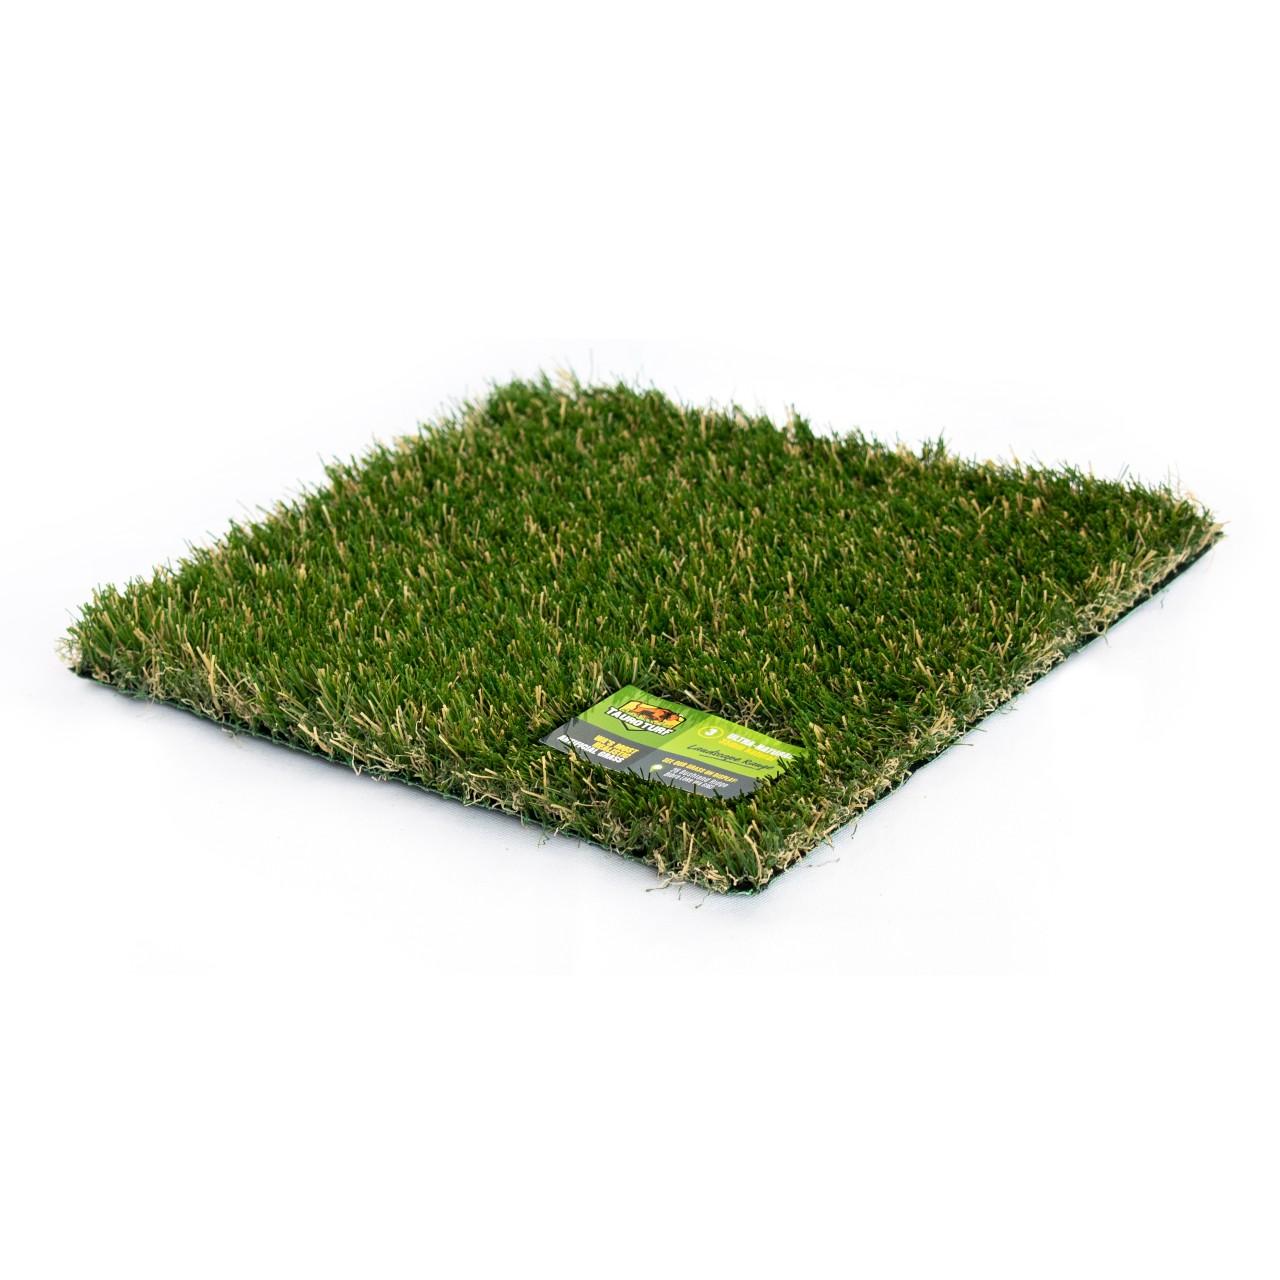 Ultra Natural grass image